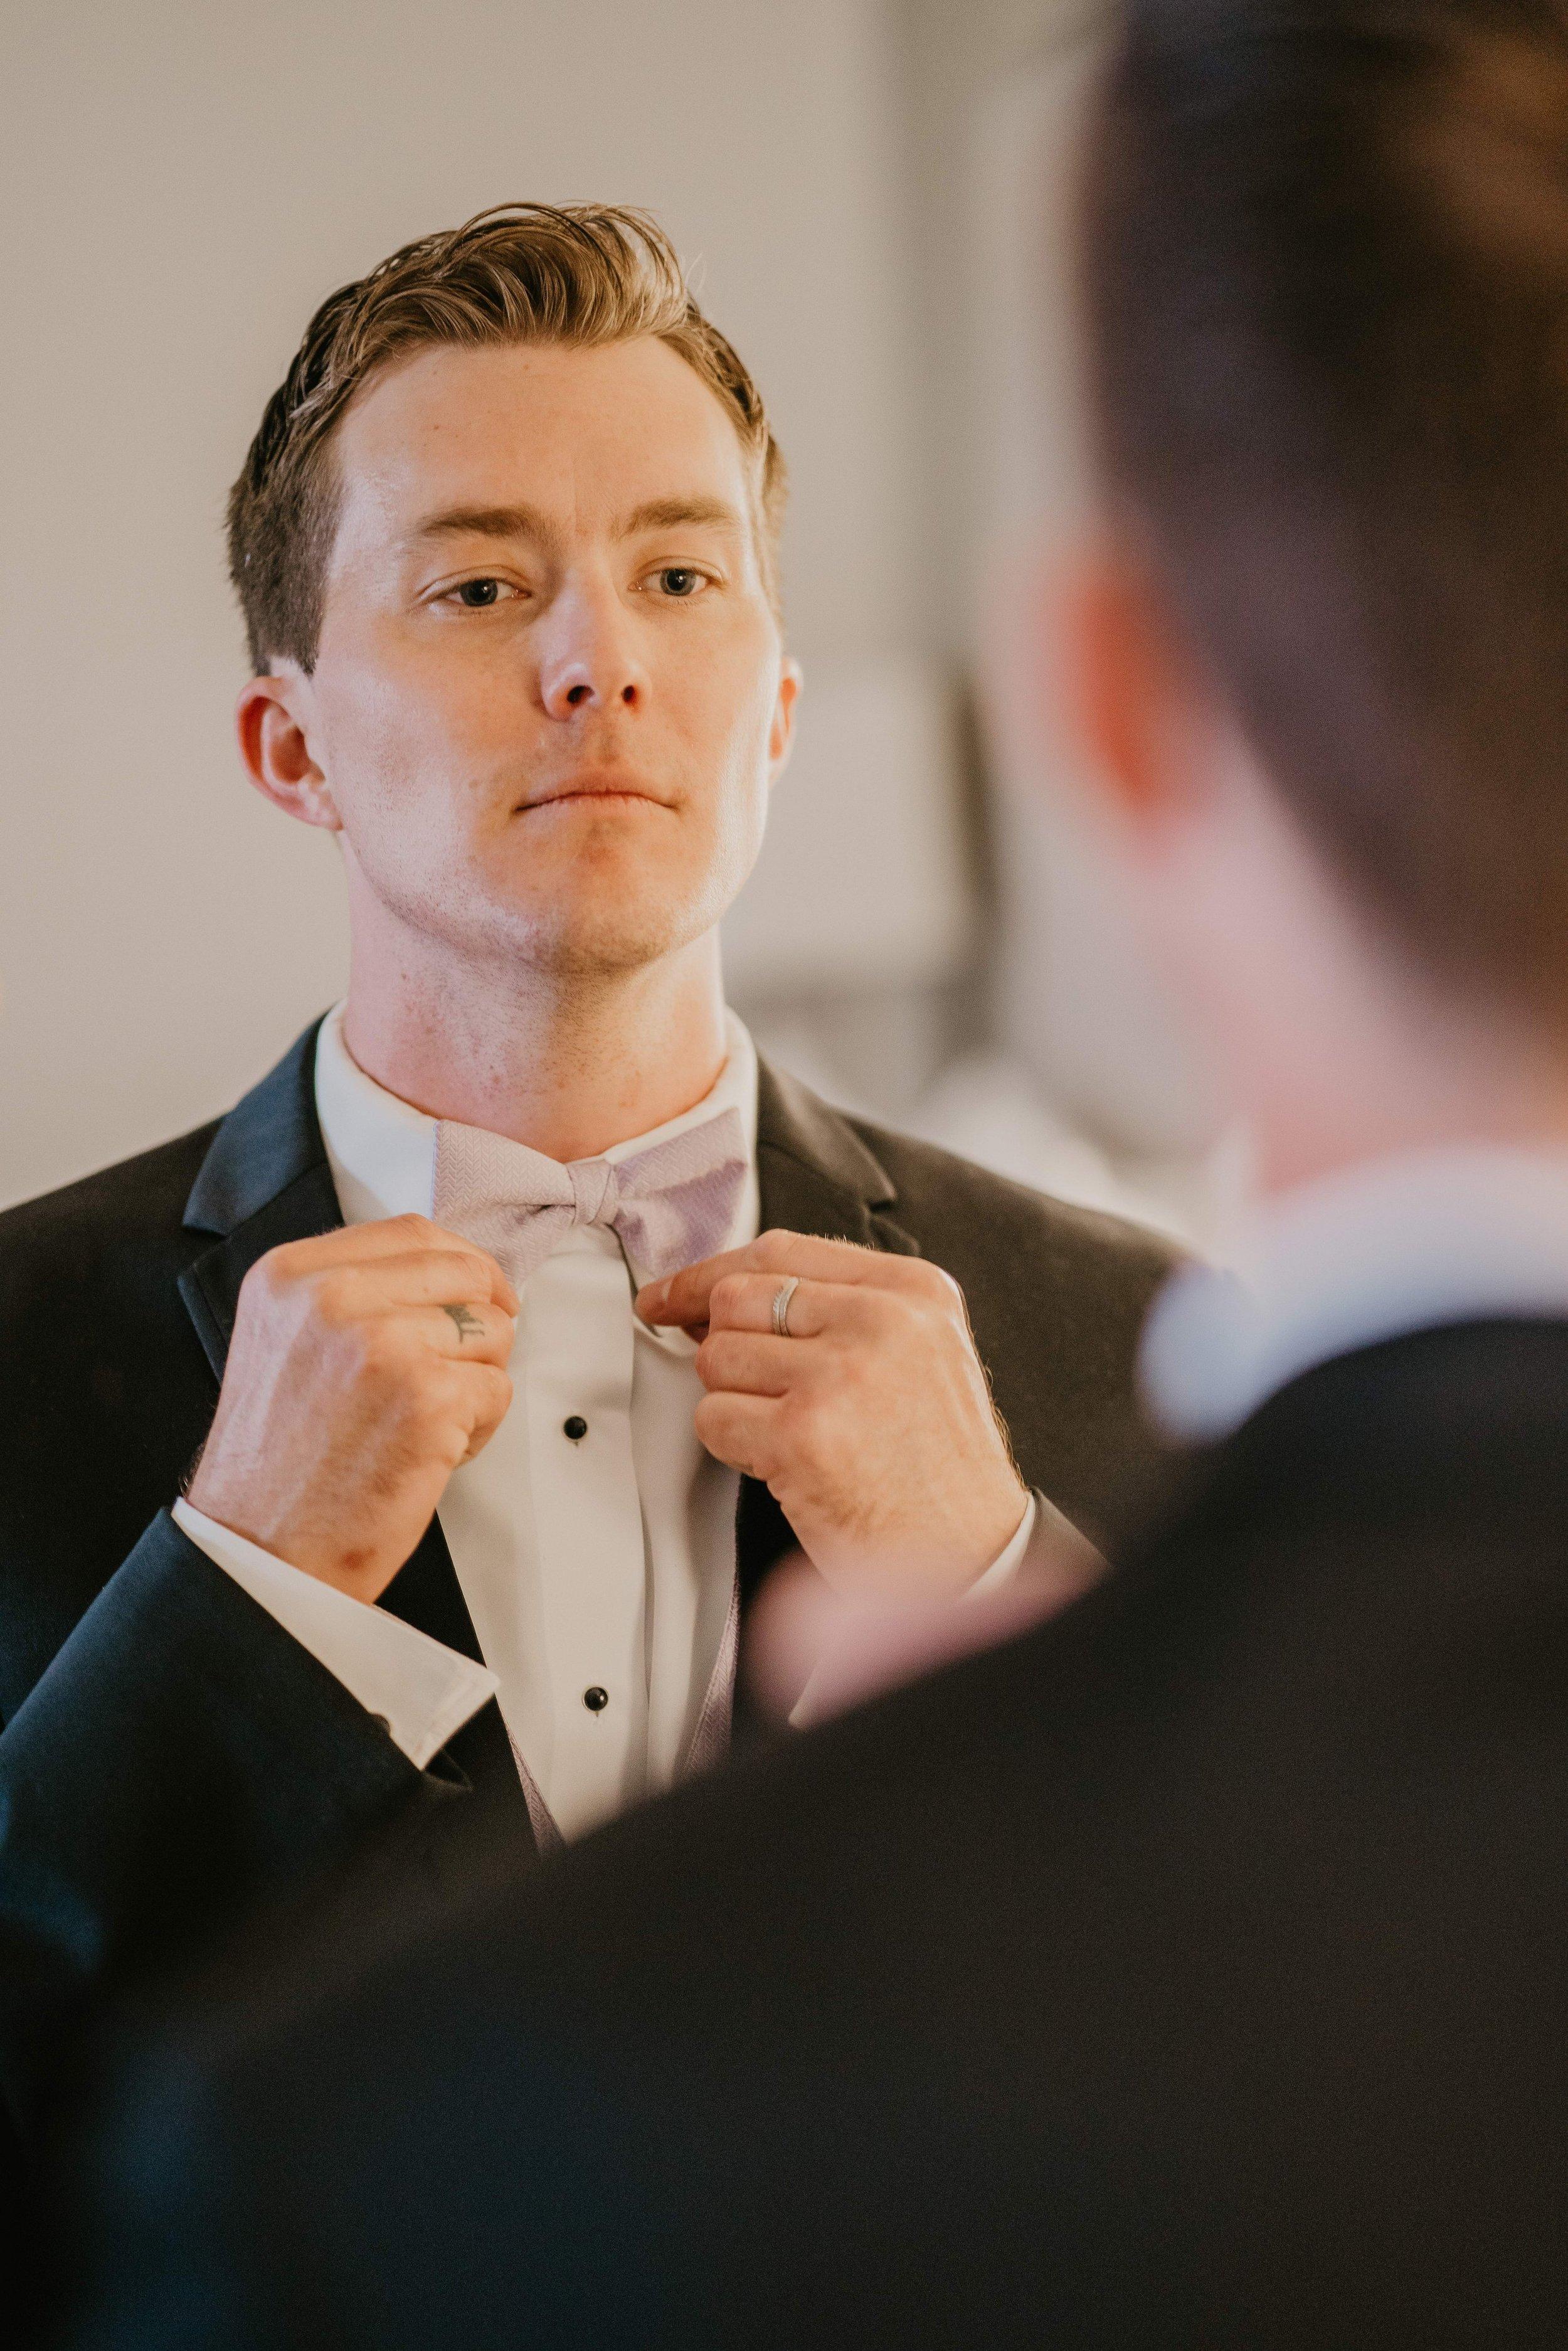 www.santabarbarawedding.com | Candice Marie Photography | Hilton Santa Barbara Beachfront Resort | Dalina Klan | Once in a Lifetime Weddings | Groom Getting Ready